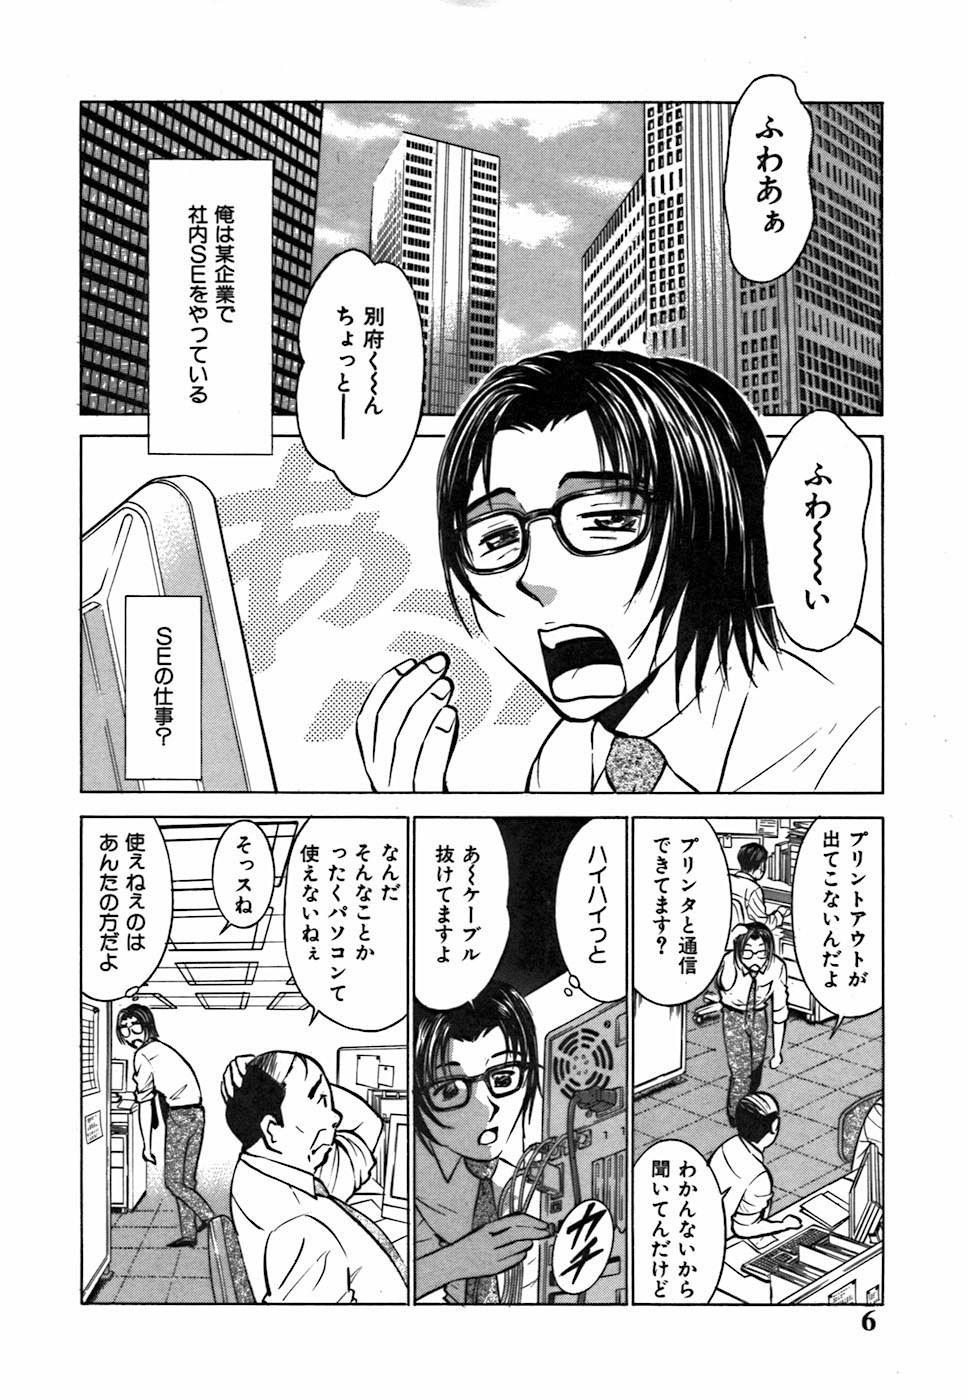 Kimi ga Nozomu Katachi | Appearance for which you hope 5